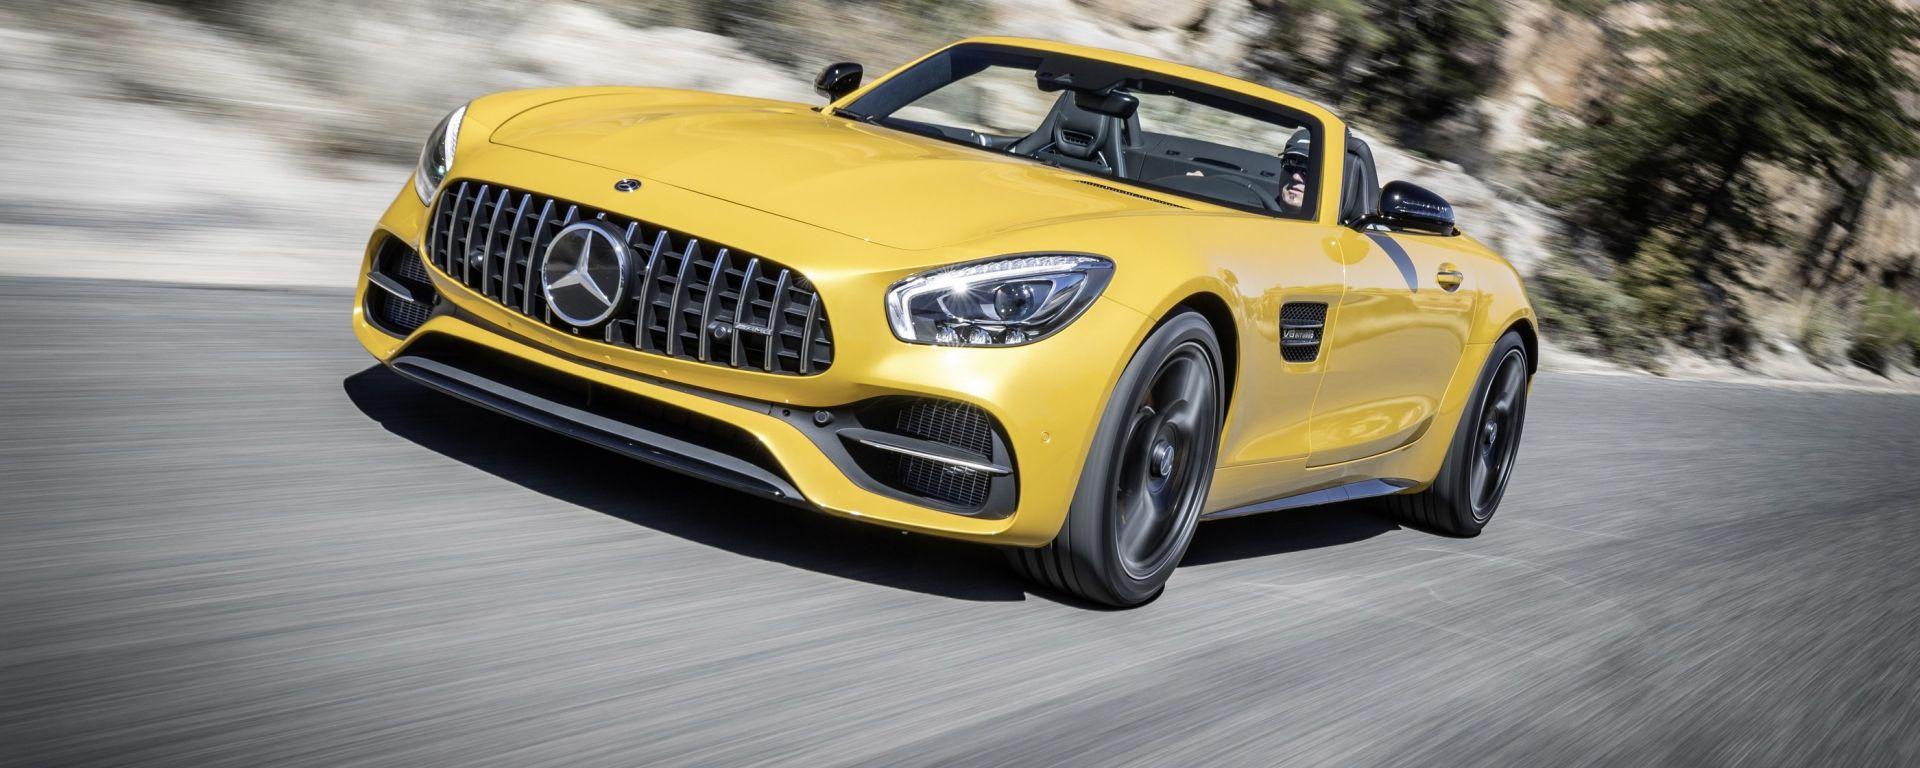 Mercedes-AMG GT C Roadster: cabrio brutale e confortevole